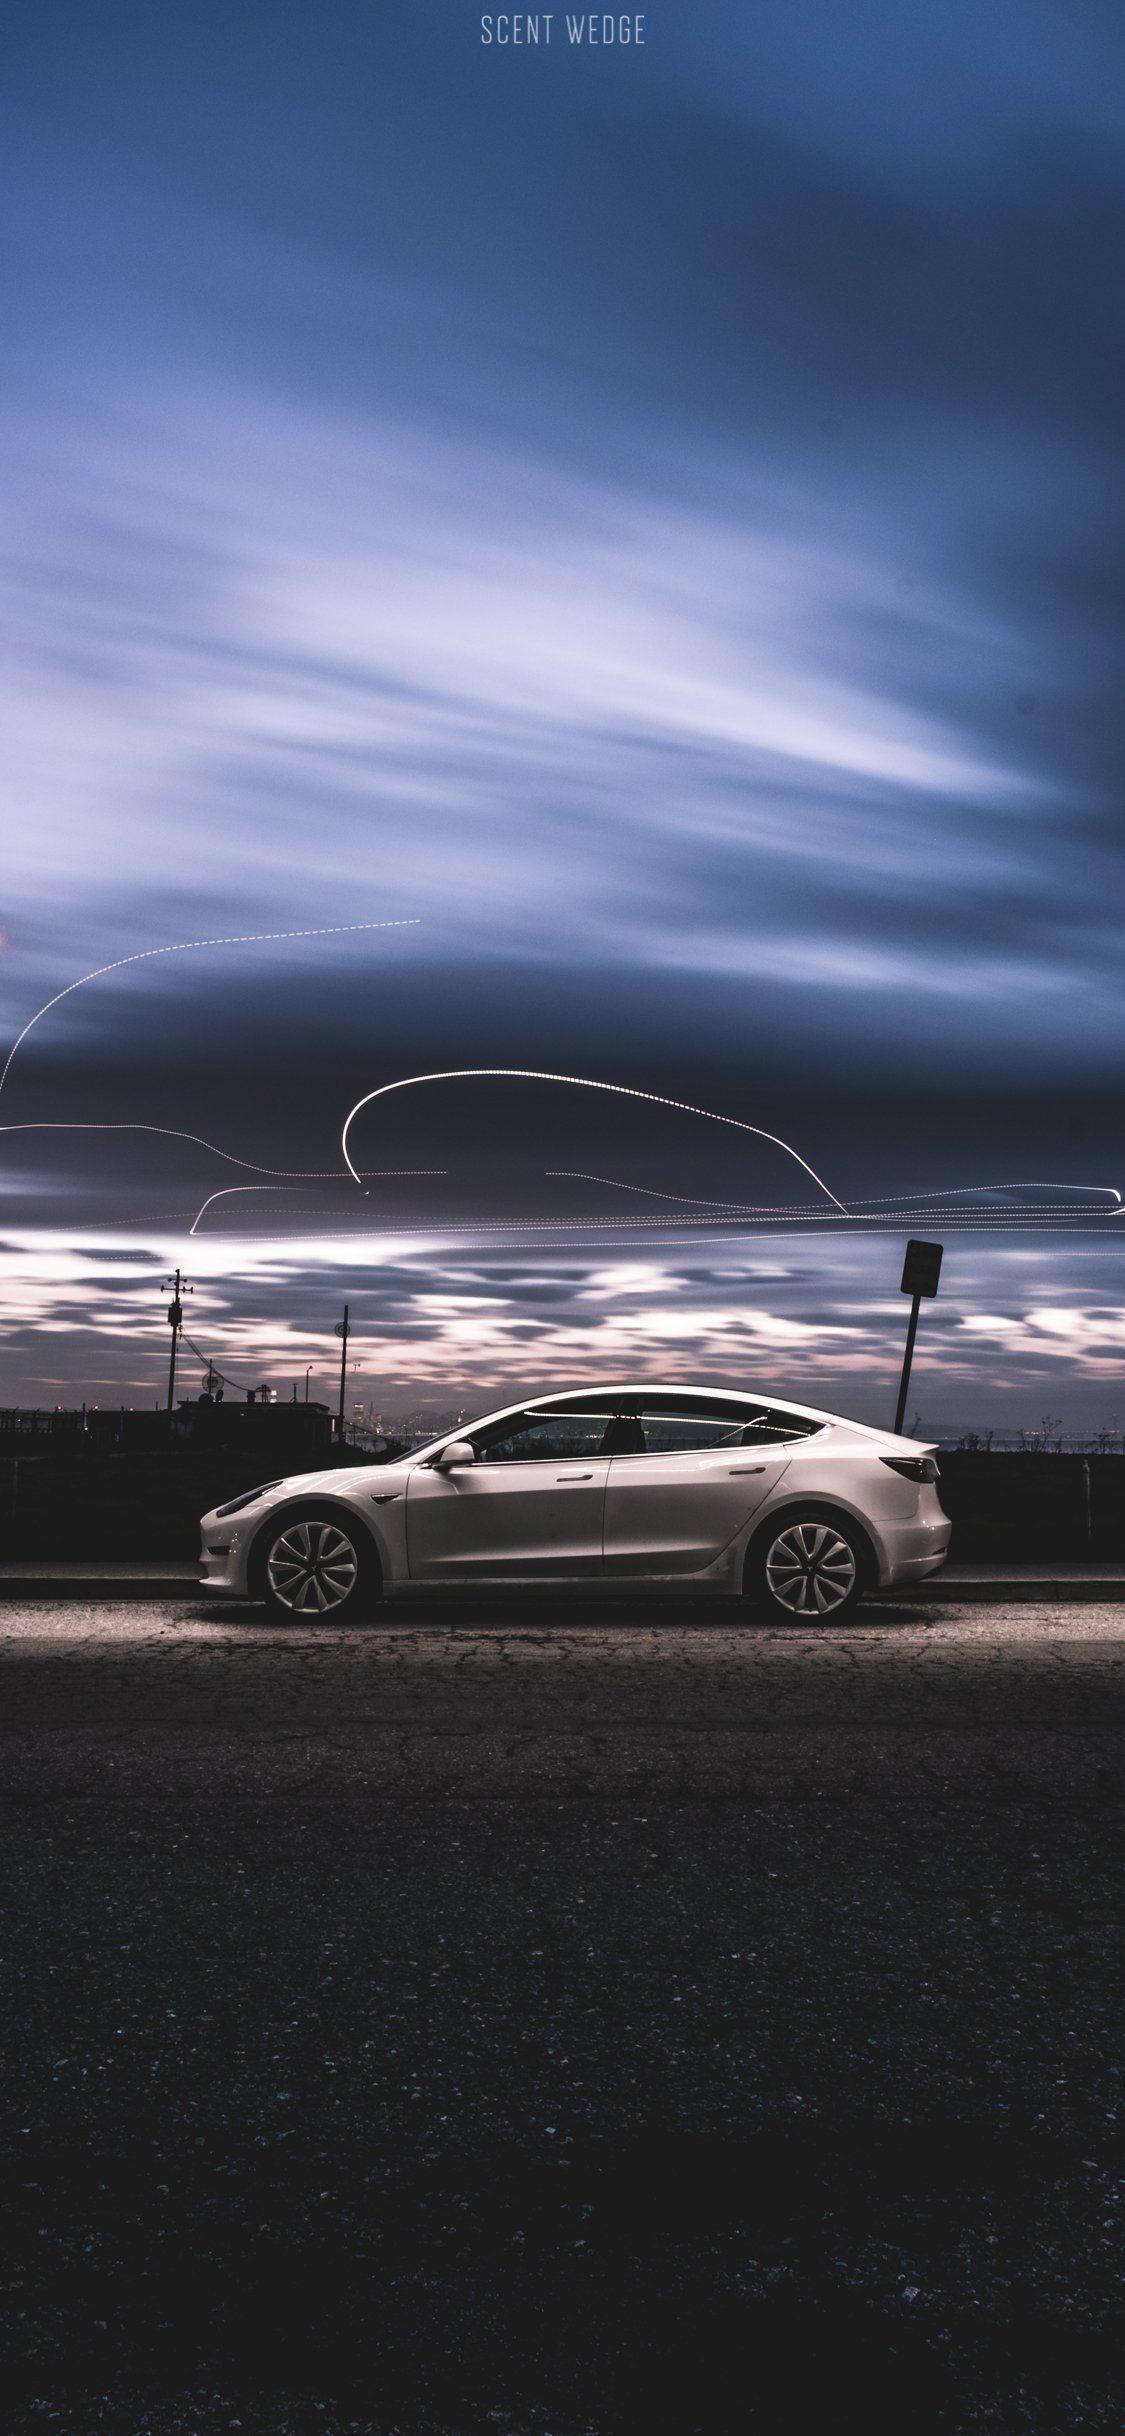 Tesla Model 3 Iphone Wallpapers Top Free Tesla Model 3